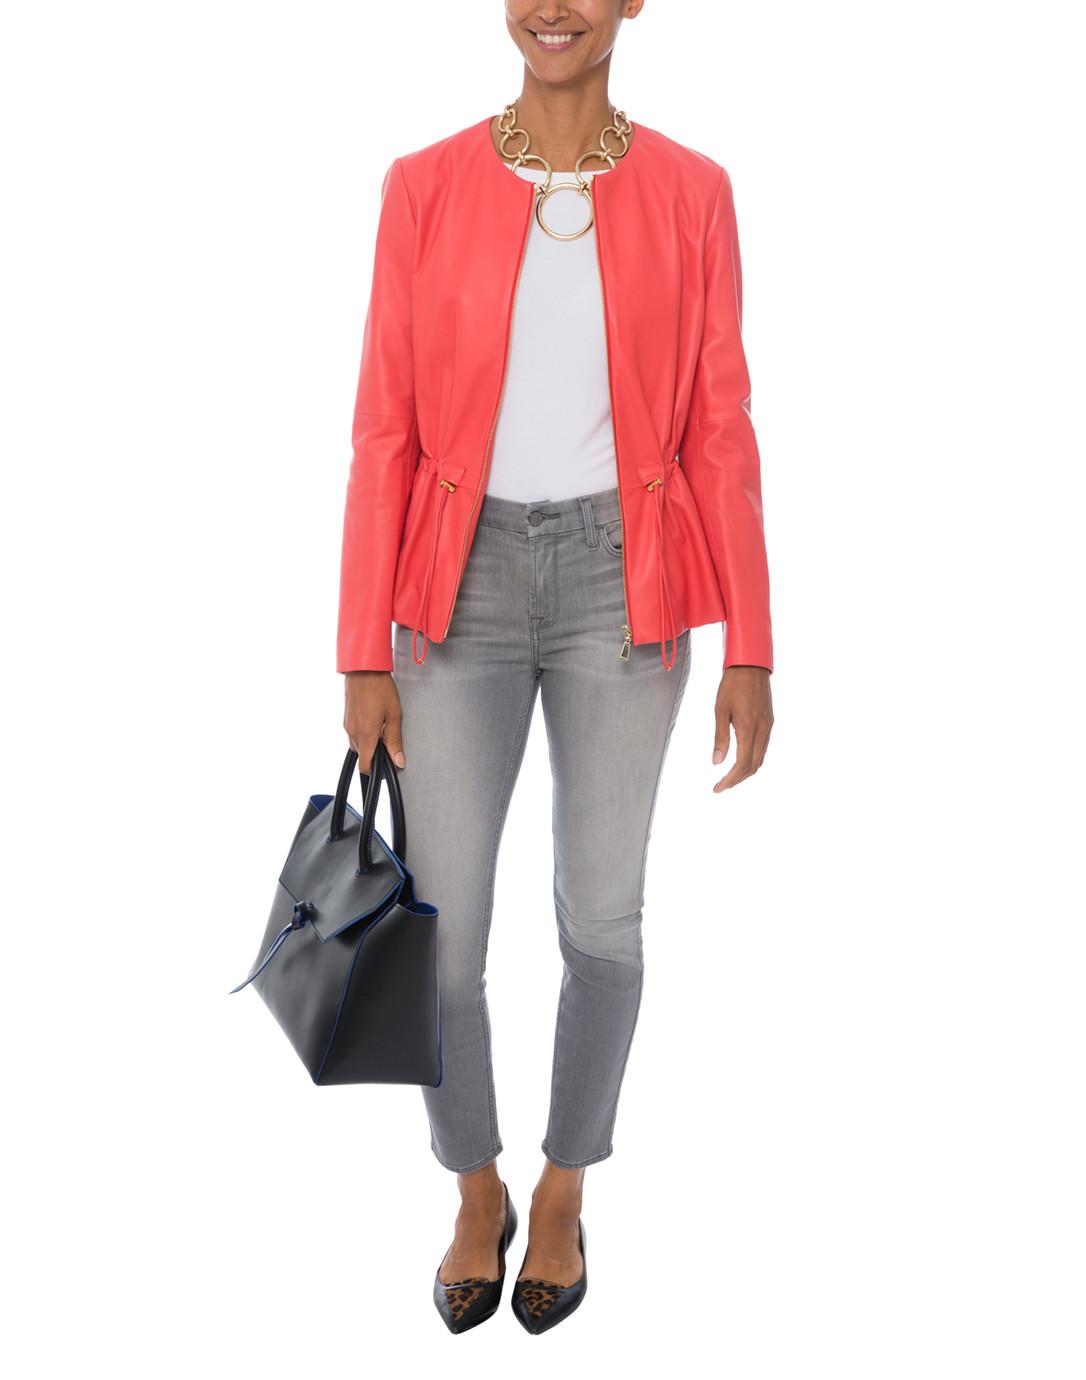 b913d39ef116 Lumia Coral Drawstring Waist Leather Jacket | Escada Sport | Halsbrook